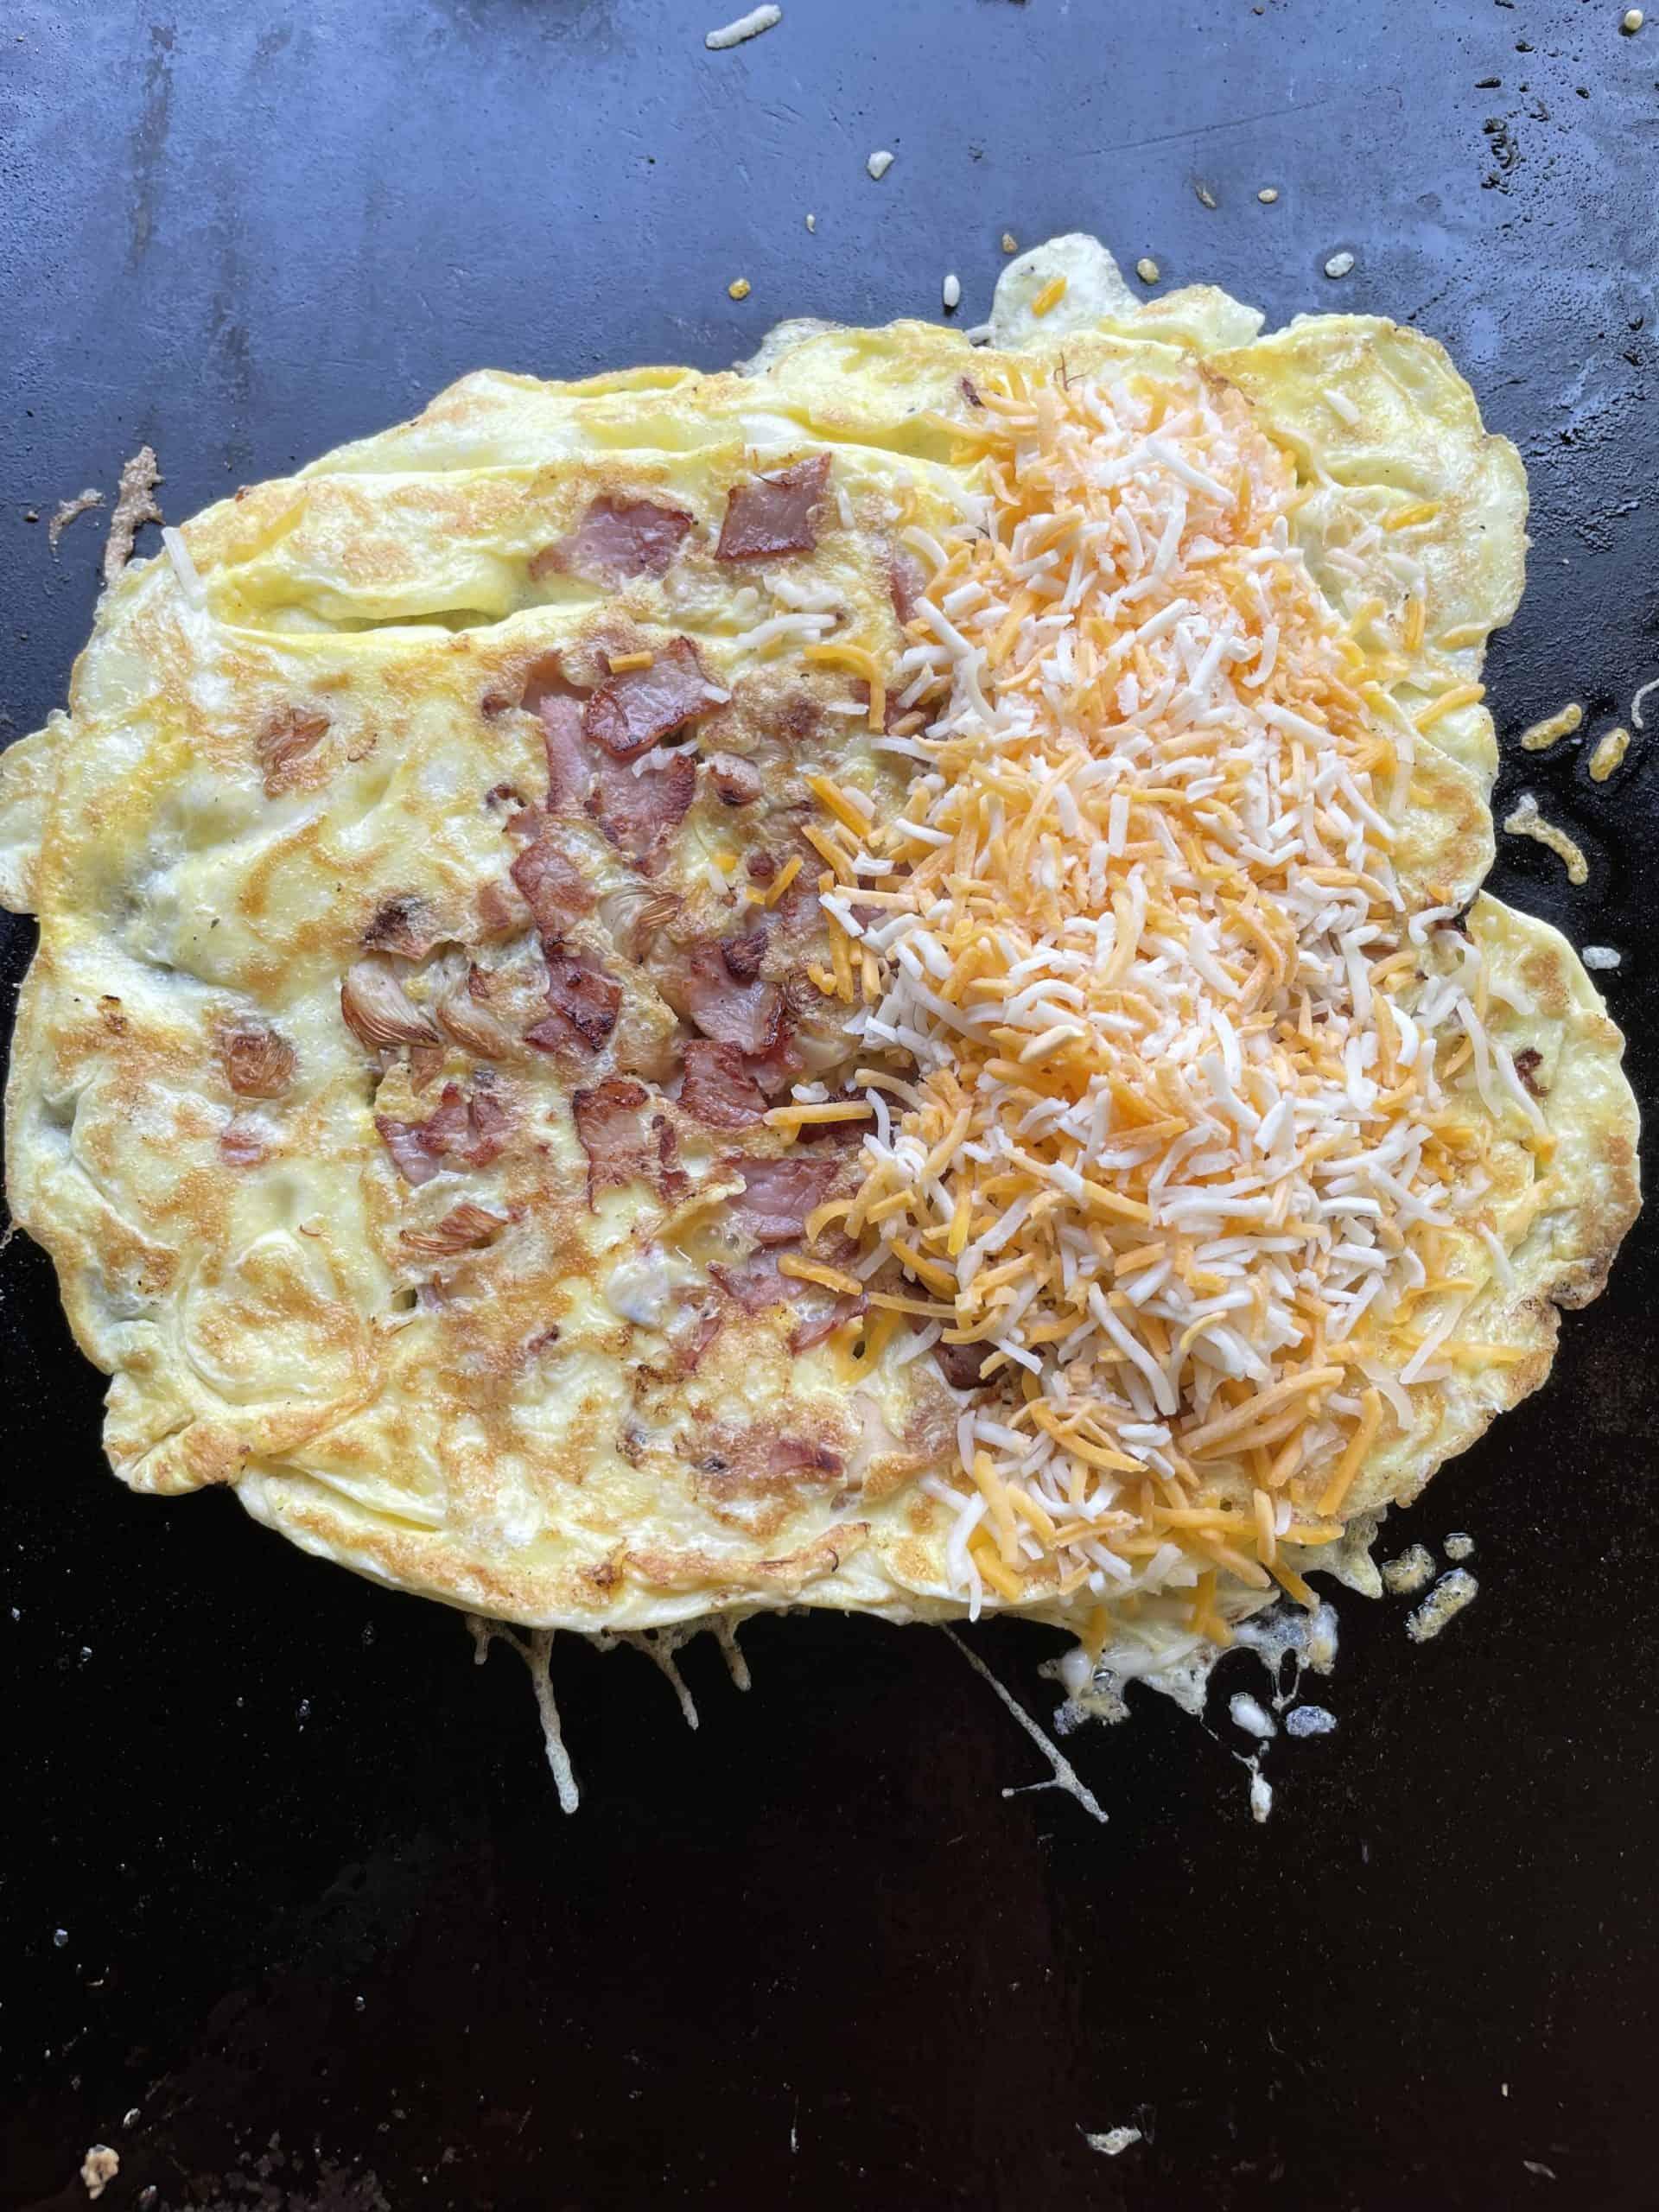 Shredded Cheese added to Half of Omelette.